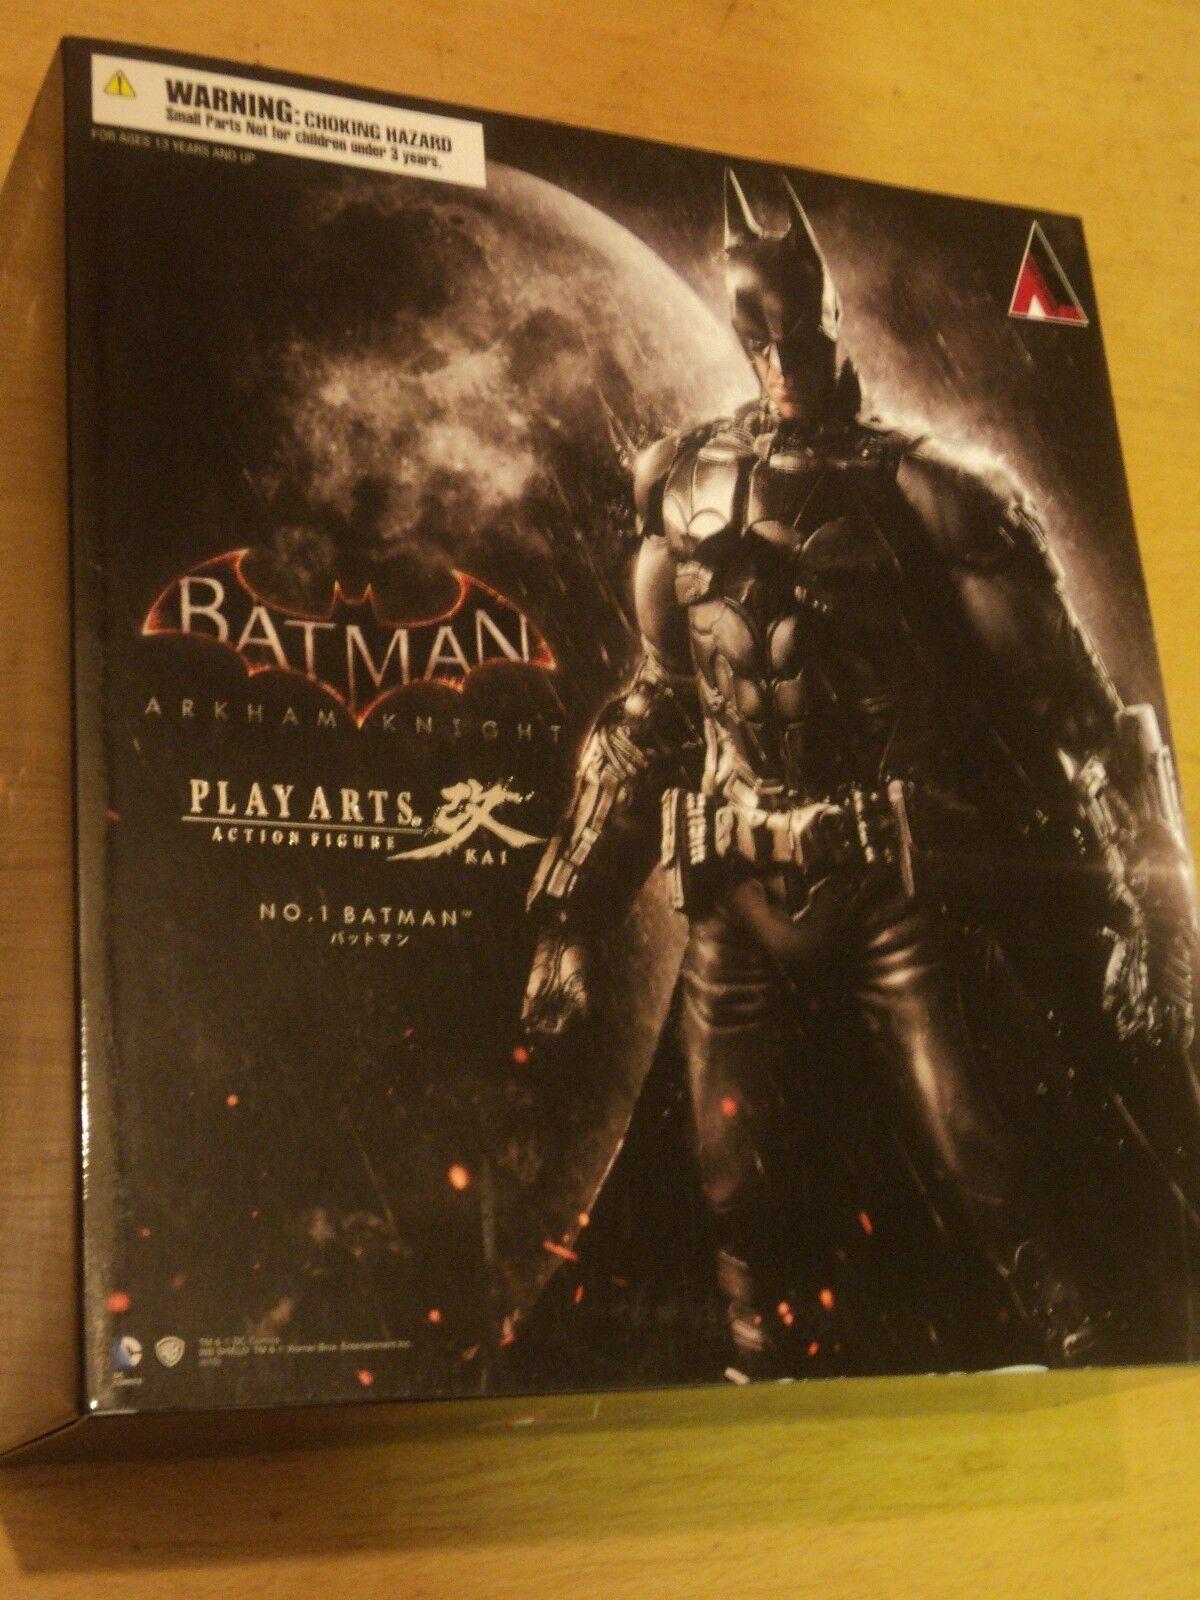 BATMAN ARKHAM KNIGHT  BATMAN PLAY ARTS KAI FIGURE - NEW AND SEALED